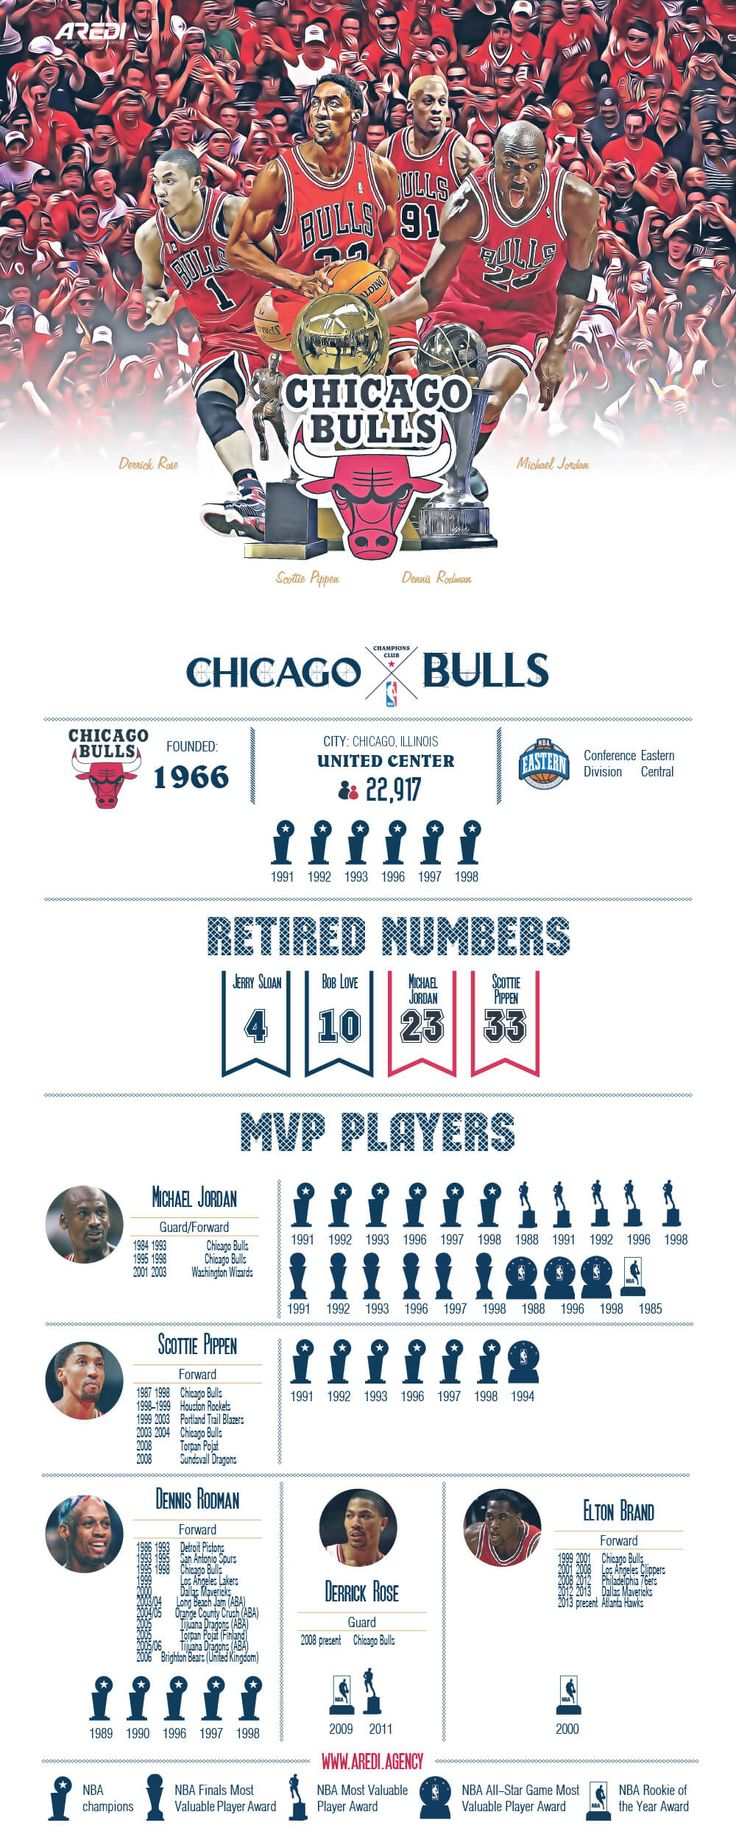 Chicago Bulls, infographic, art, sport, create, design, basketball, club, branding, NBA, MVP legends, histoty, champion, All Star game, Michael Jordan, 23, Derrick Rose, Elton Brand, Scottie Pippen, Dennis Rodman